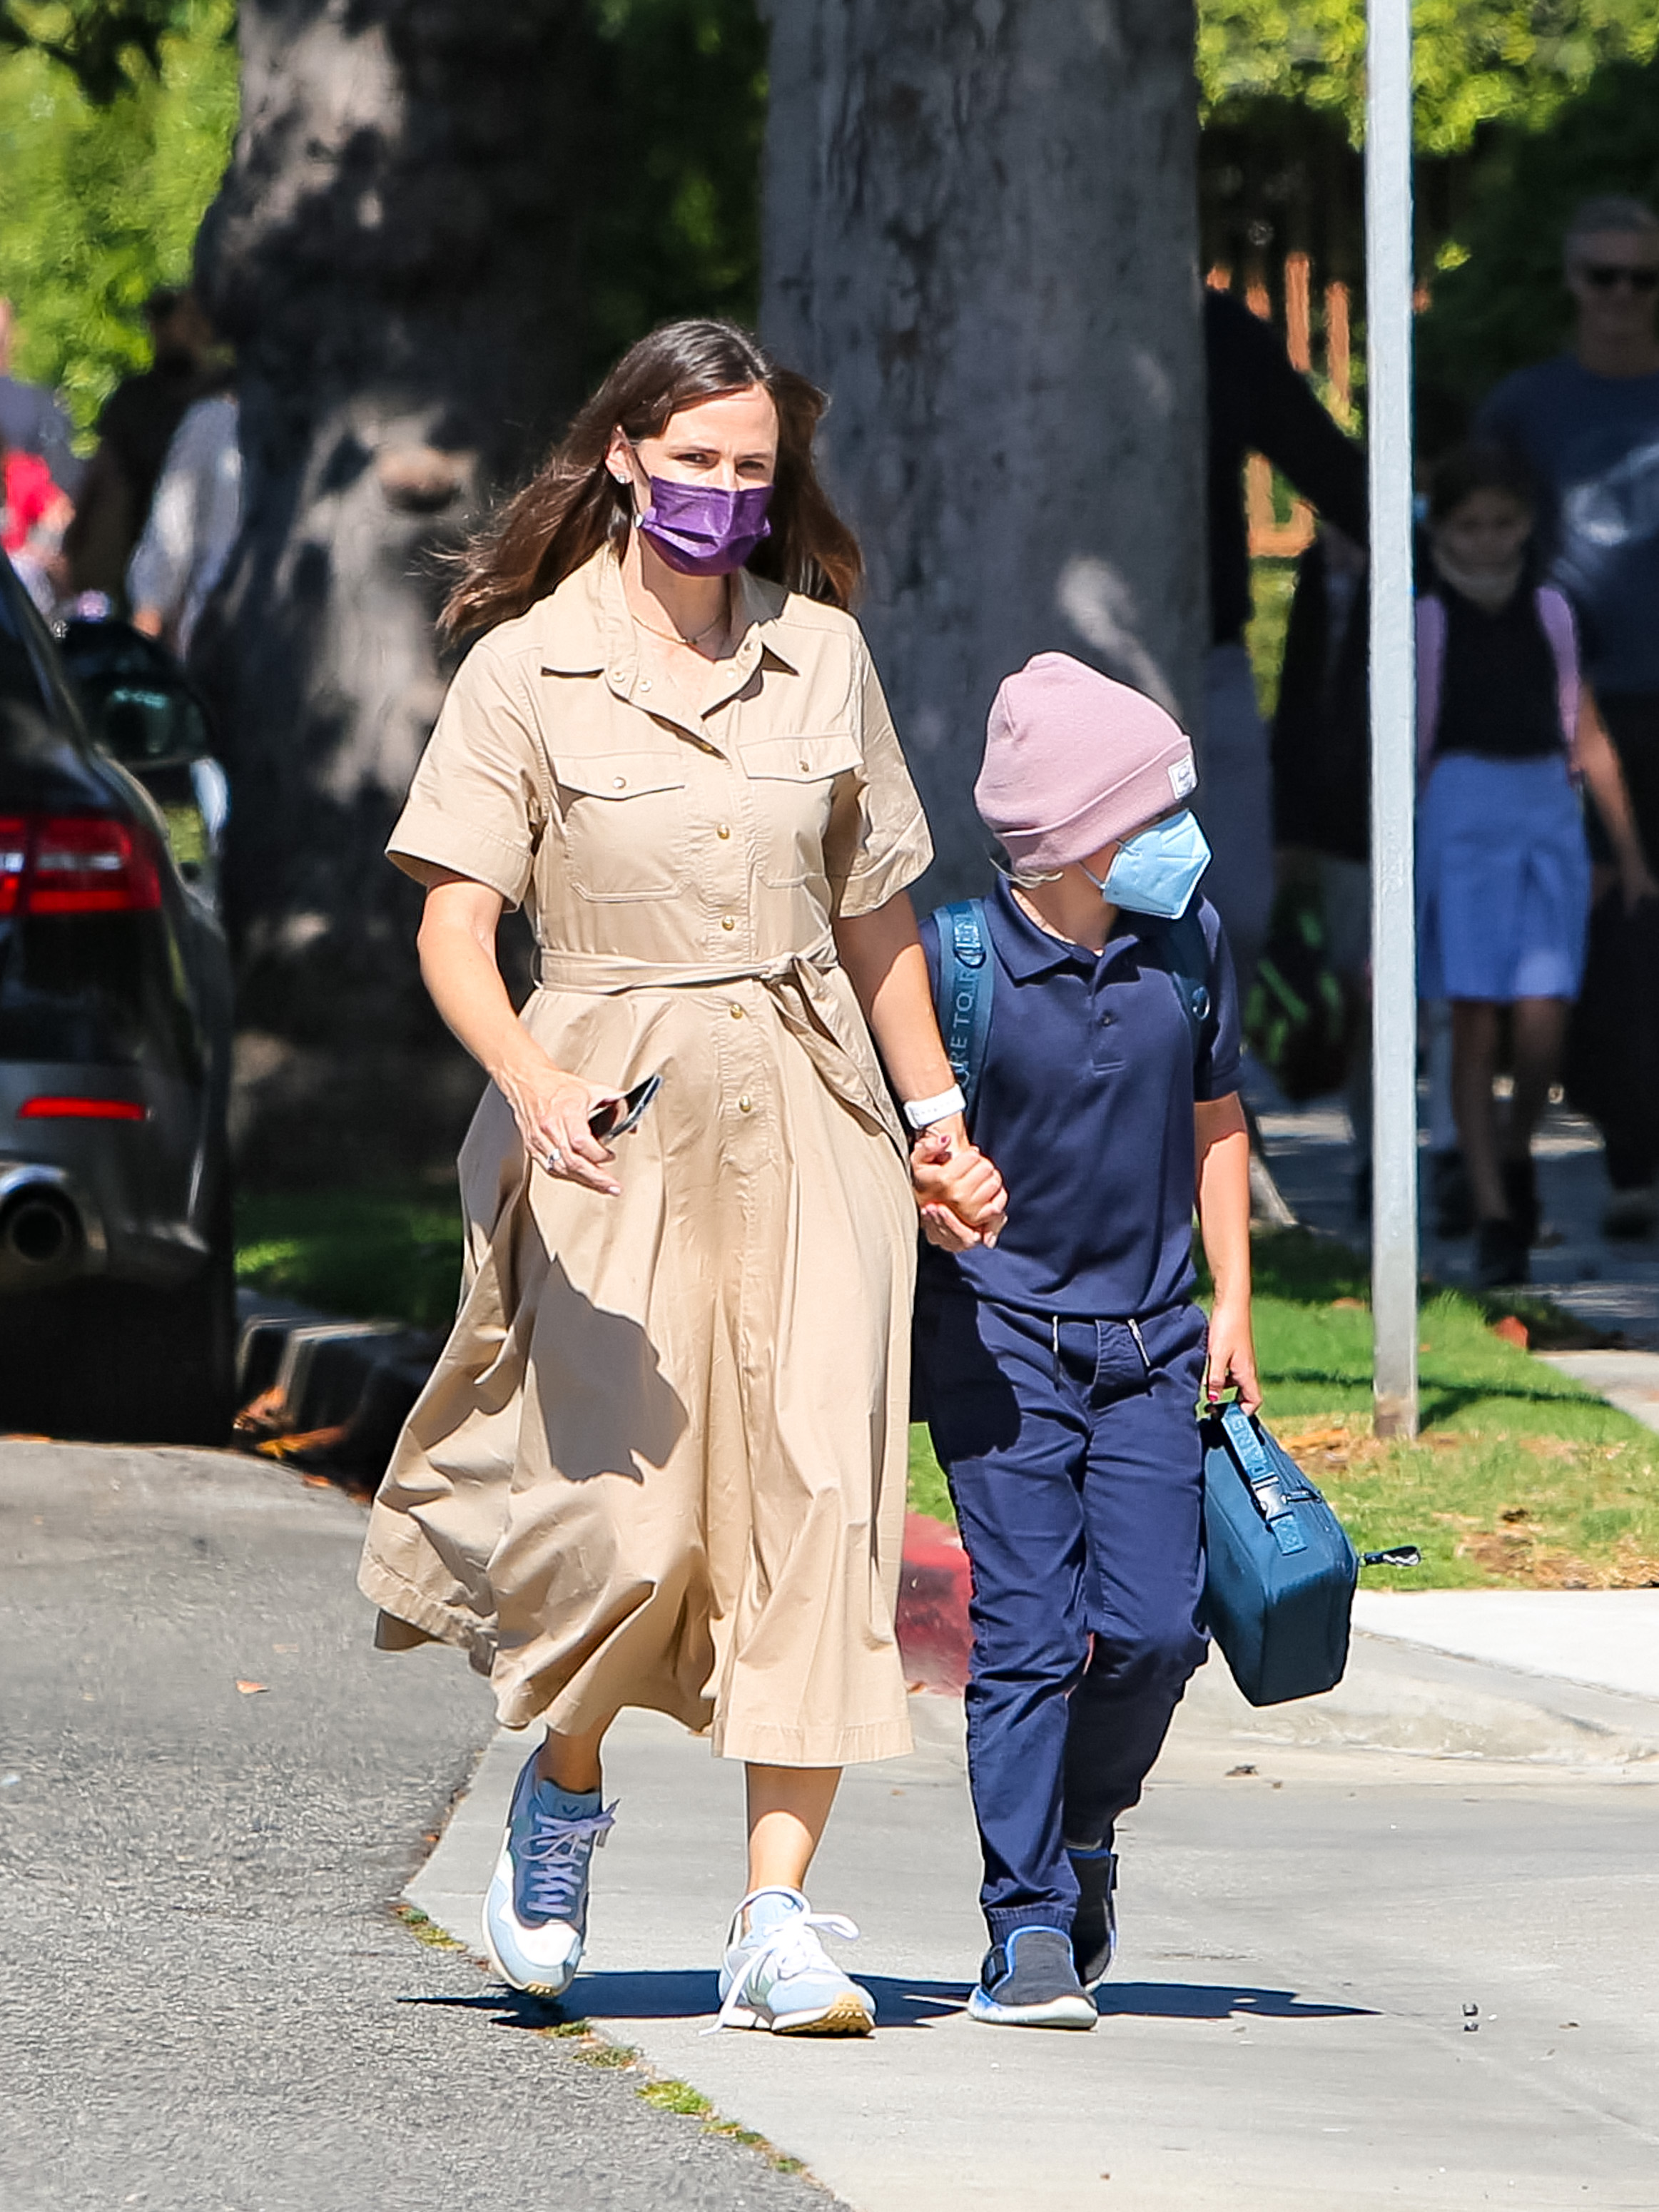 Jennifer Garner, son Samuel Affleck